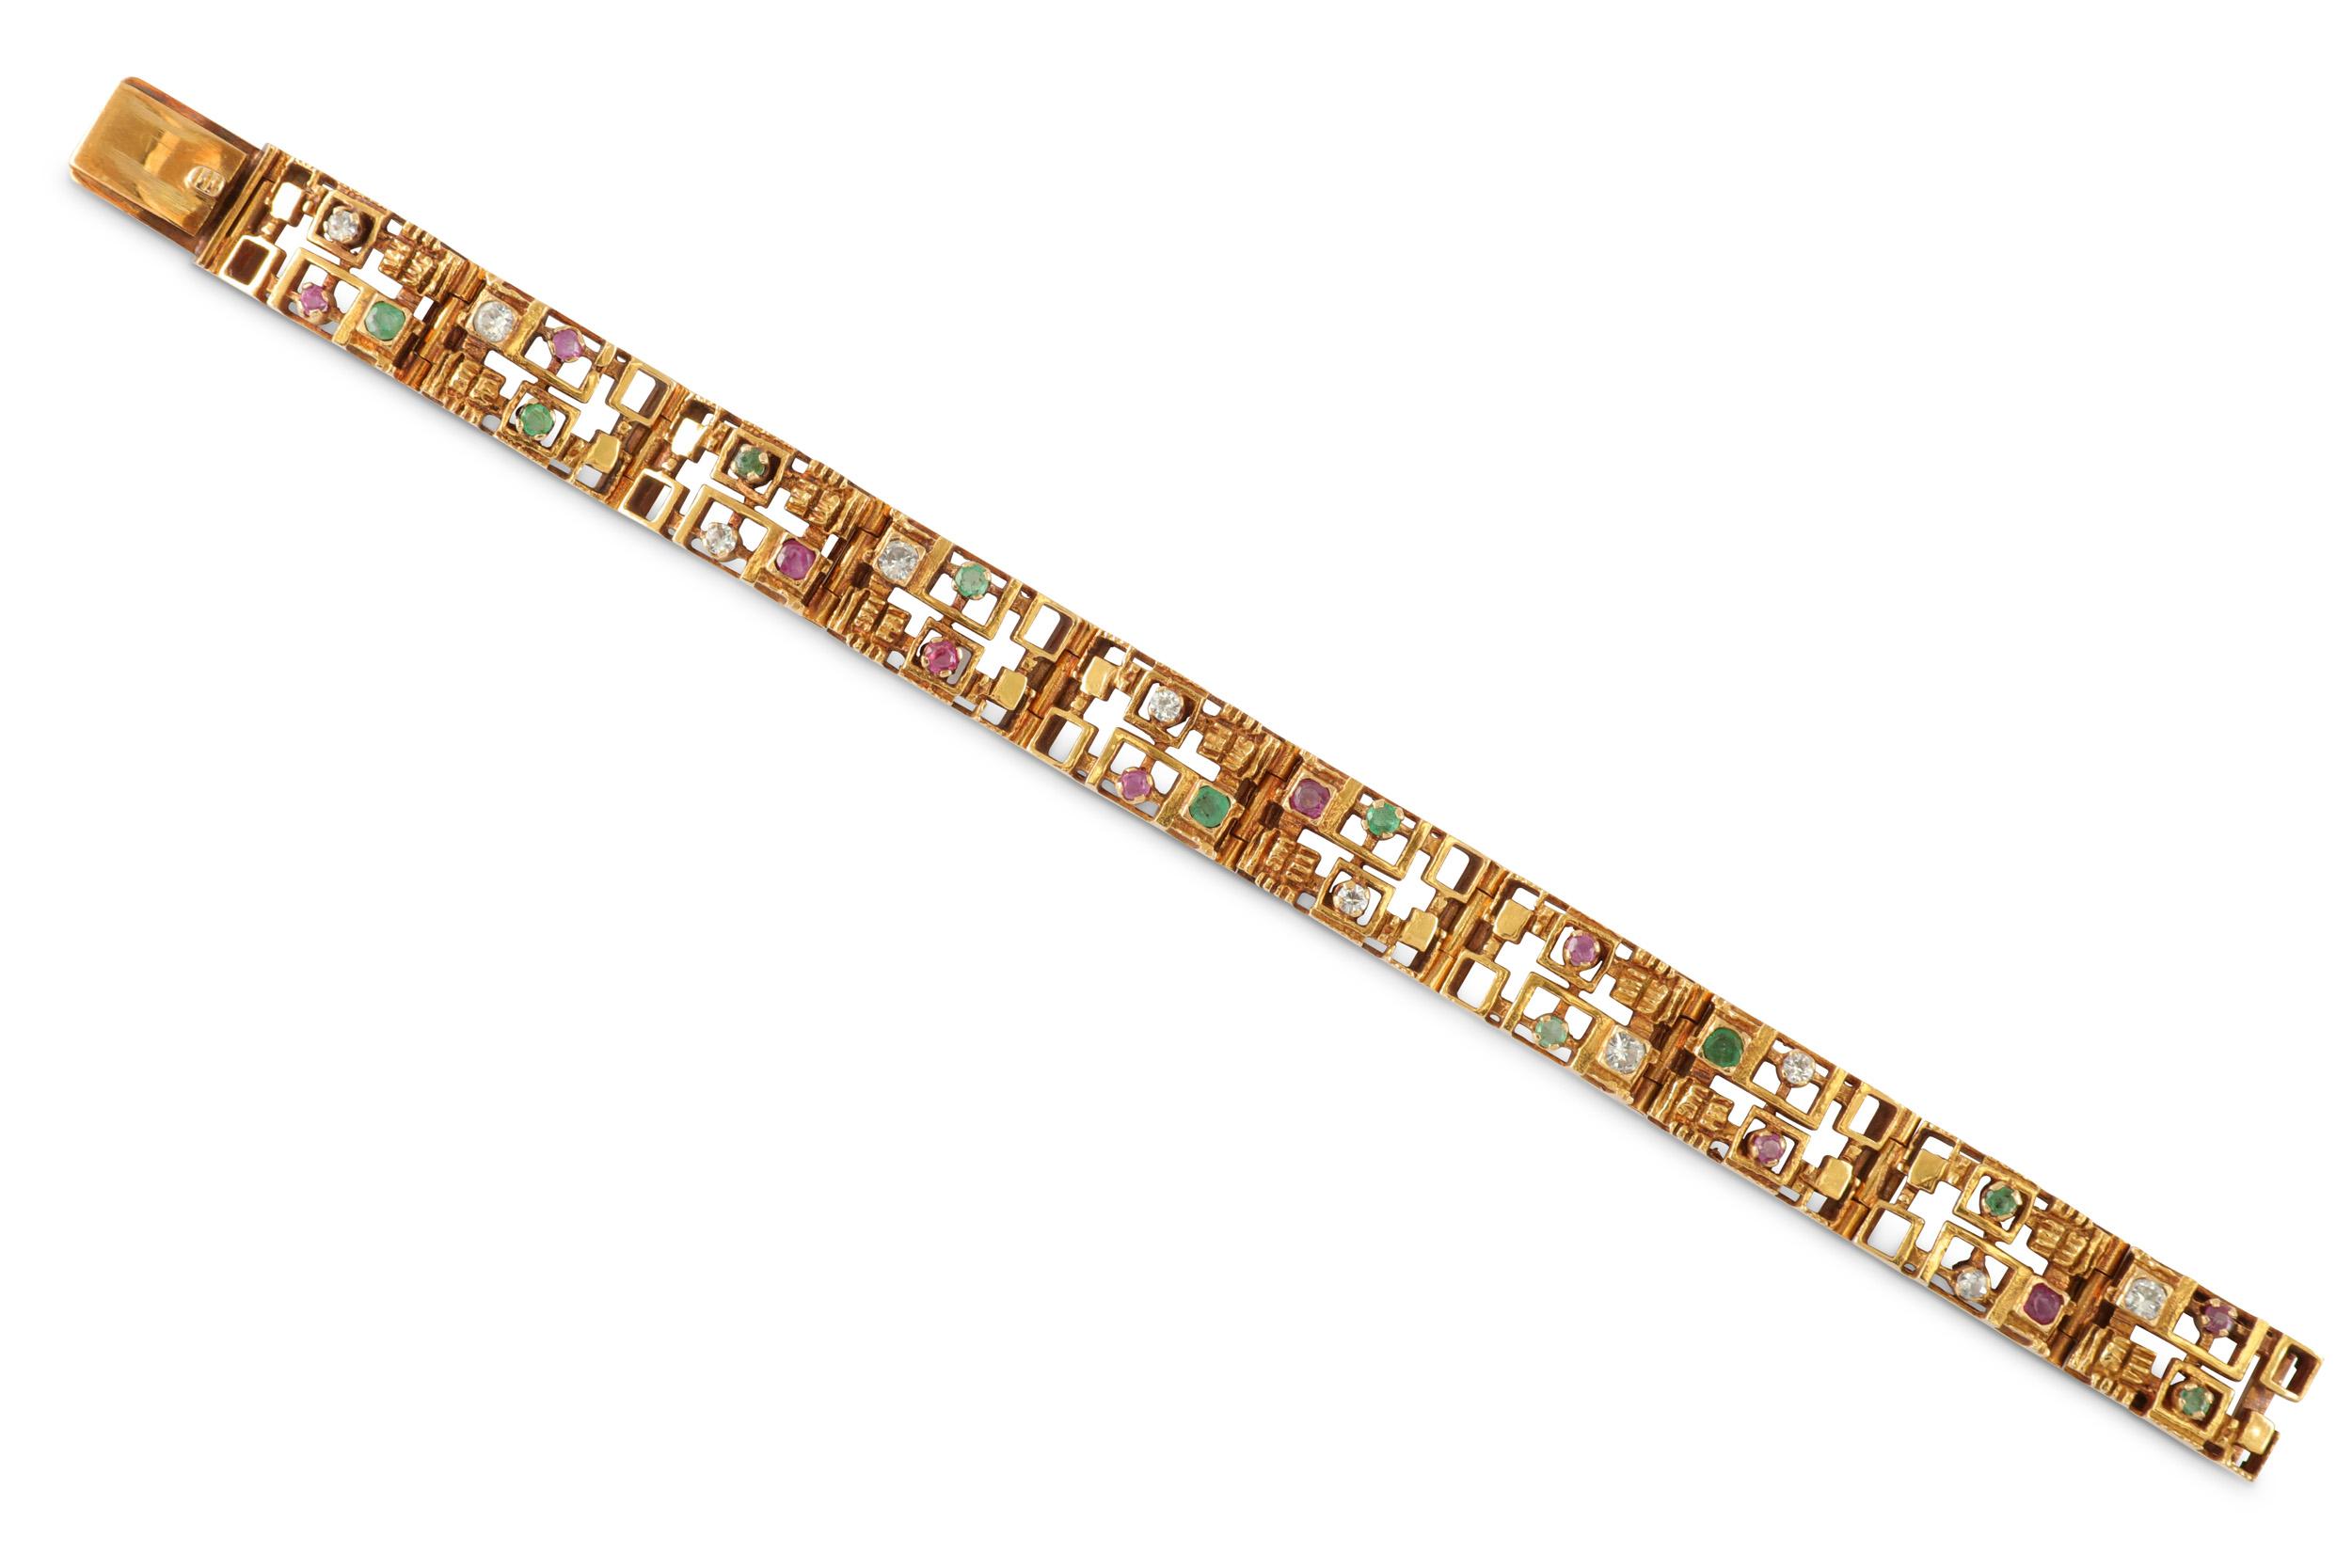 Lot 40 - A gem-set brooch / pendant, bracelet and ring suite, circa 1970